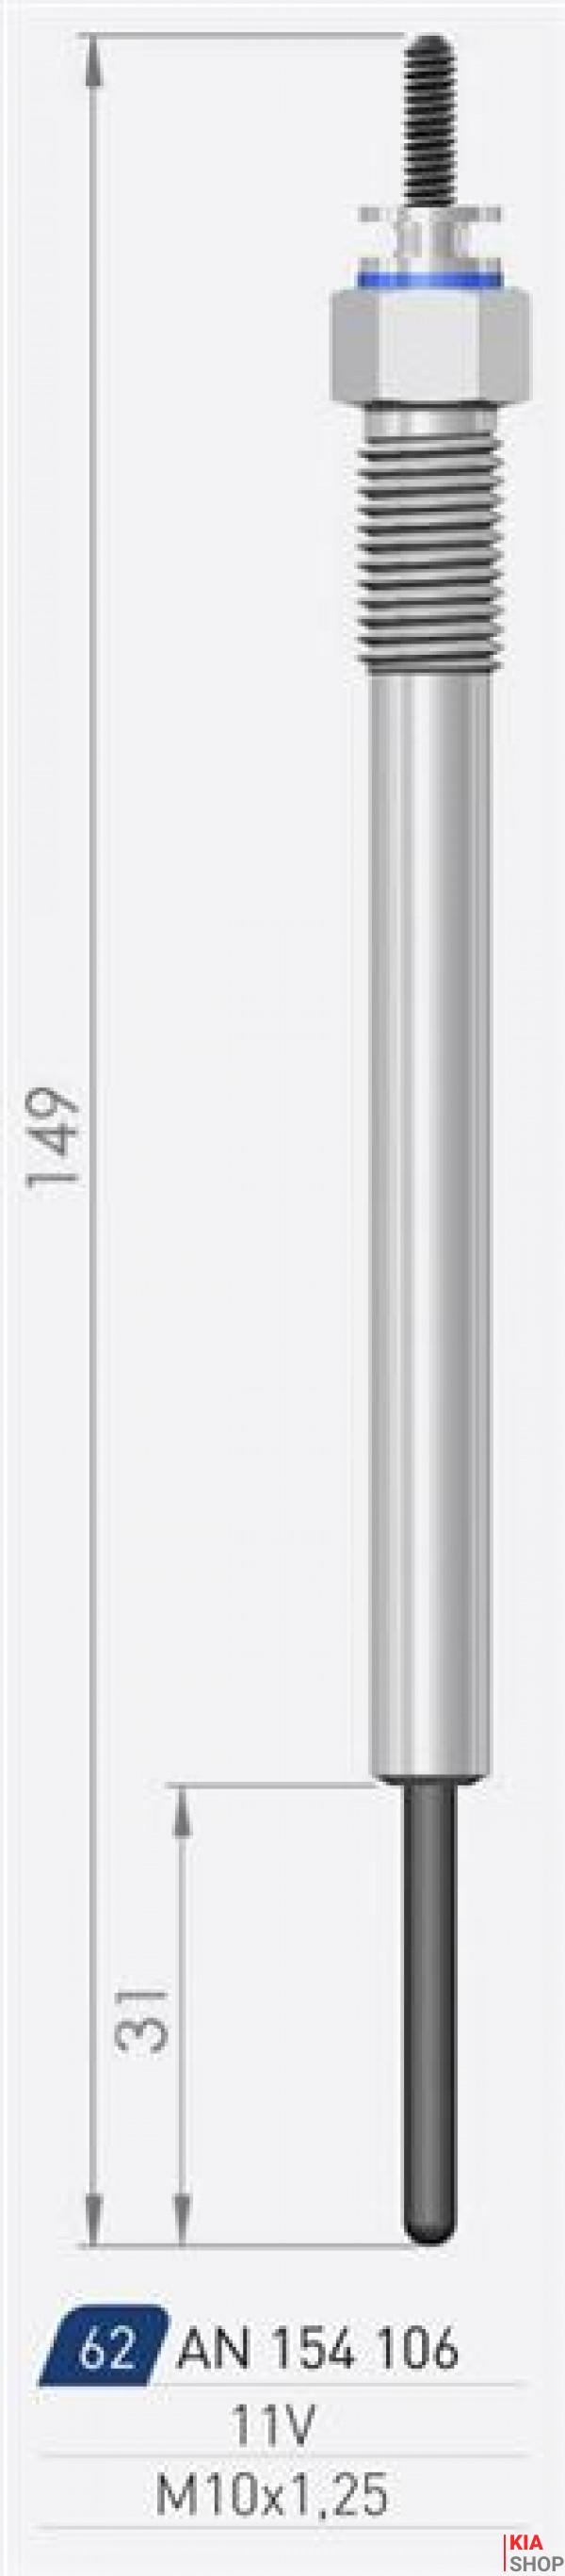 A-N PARTS HYUNDAI Свеча накала (двойная спираль) 11V H-1 97-,Sorento 2.5CRDI 02-